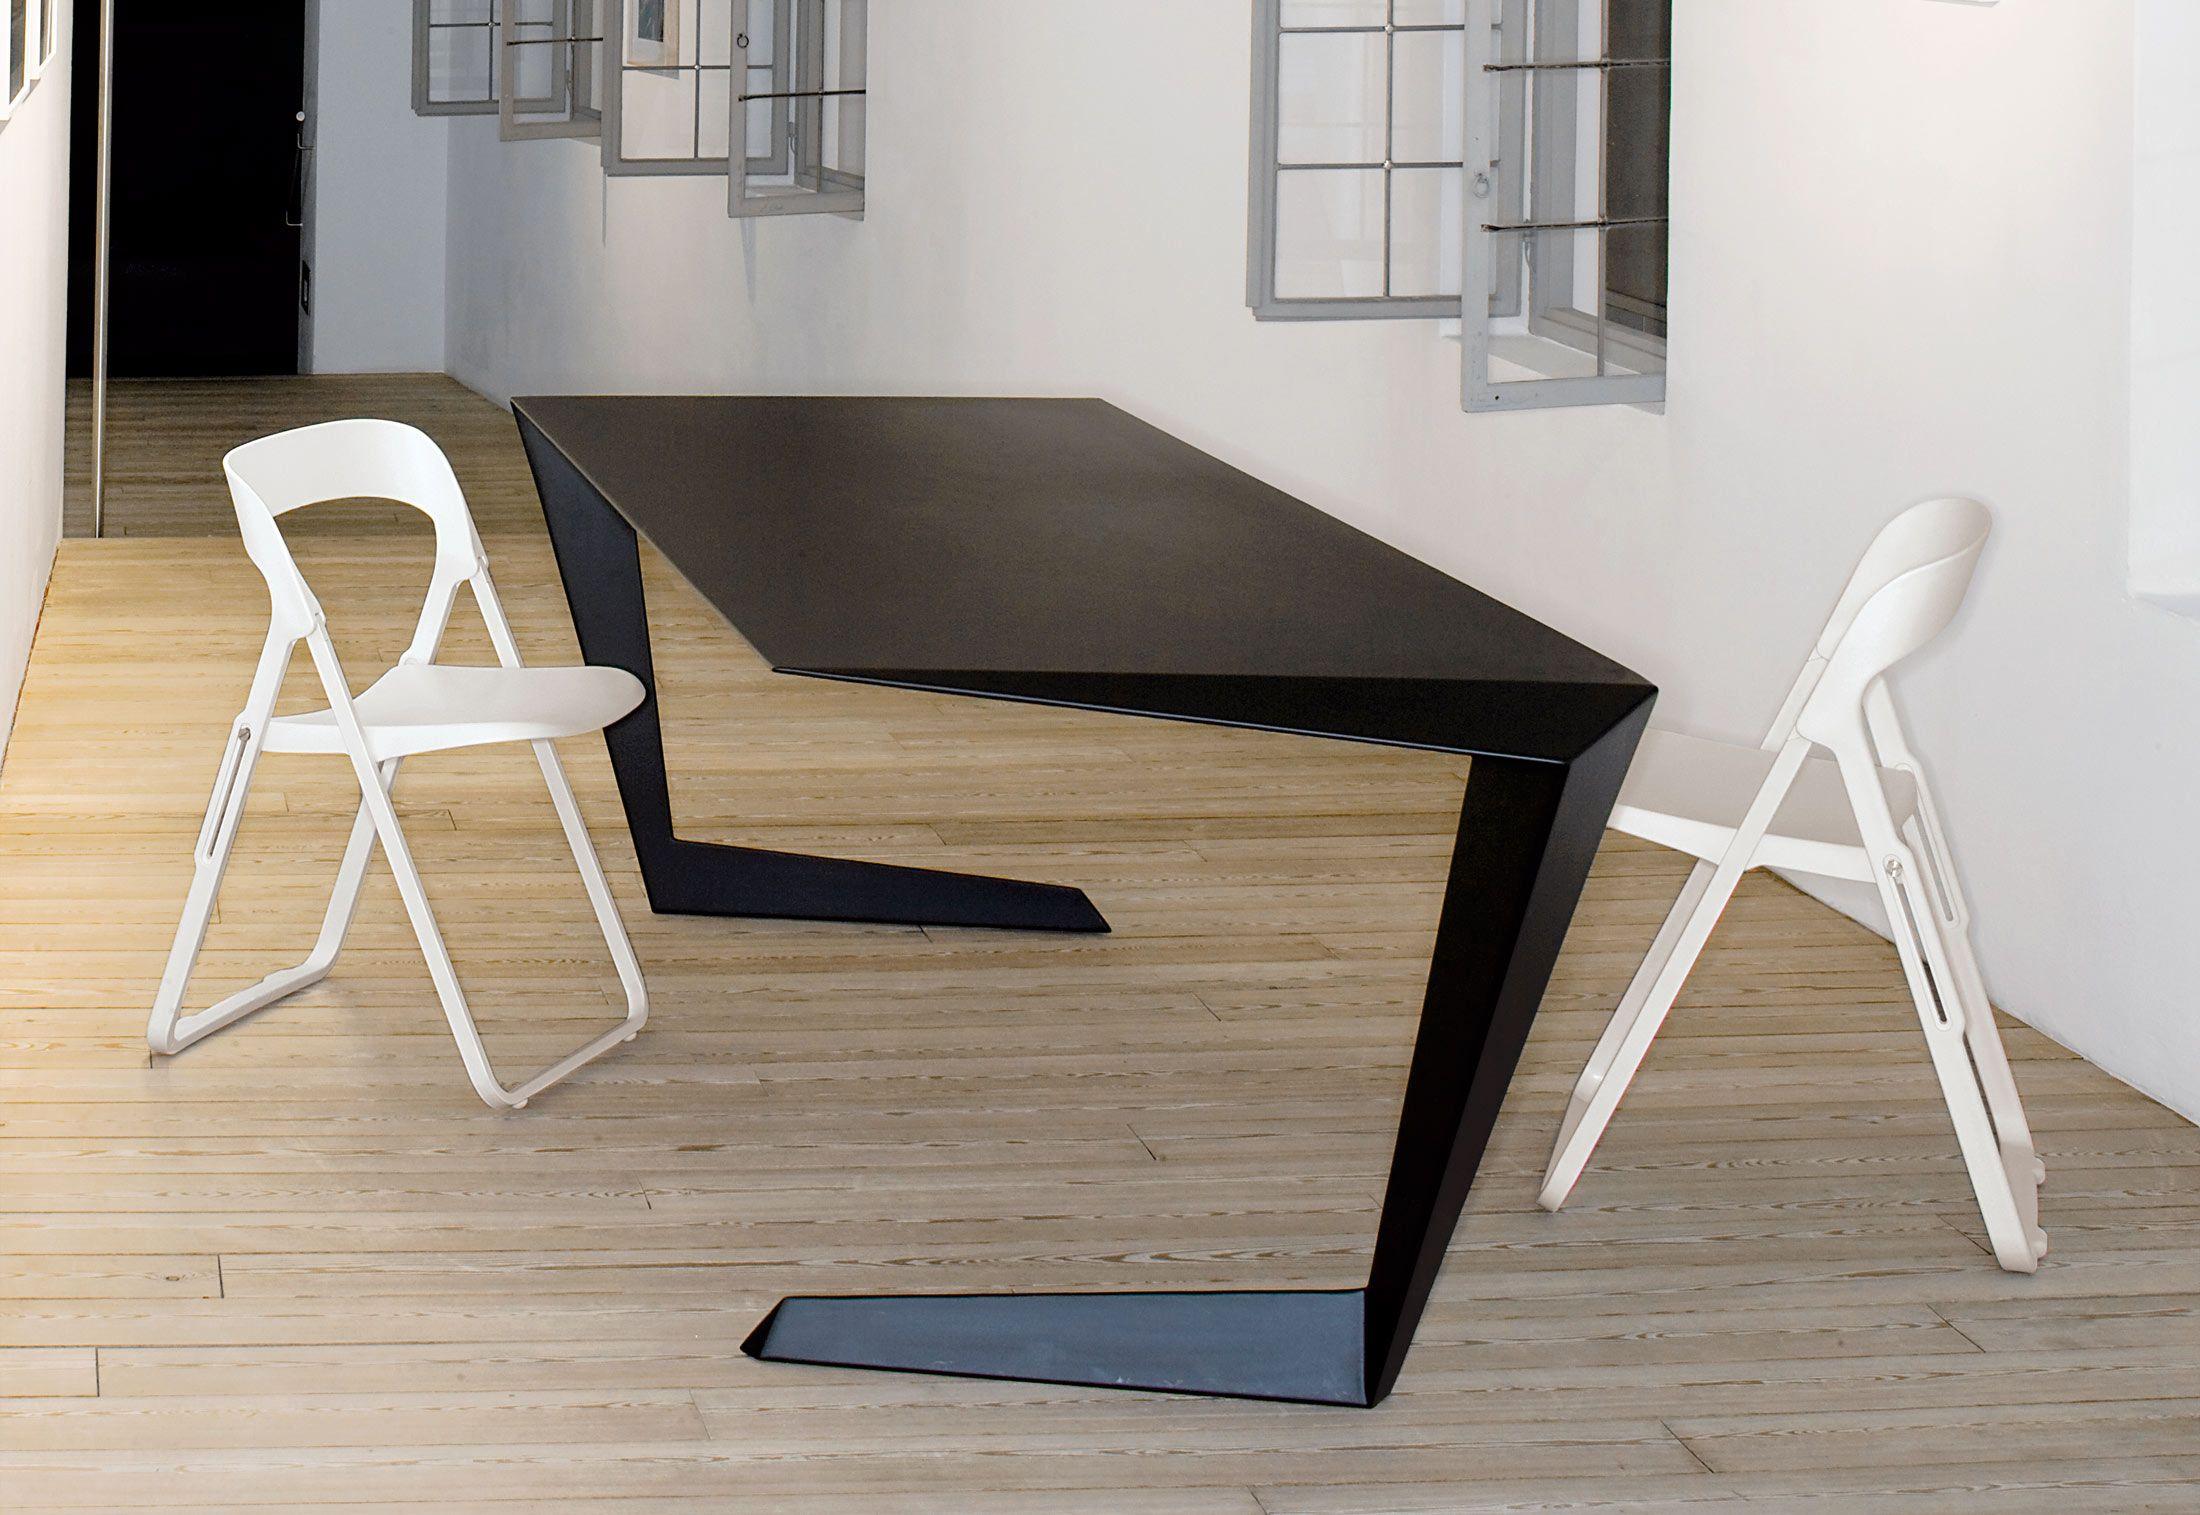 Norayr Khachatryan Casamania N7 Furniture Design